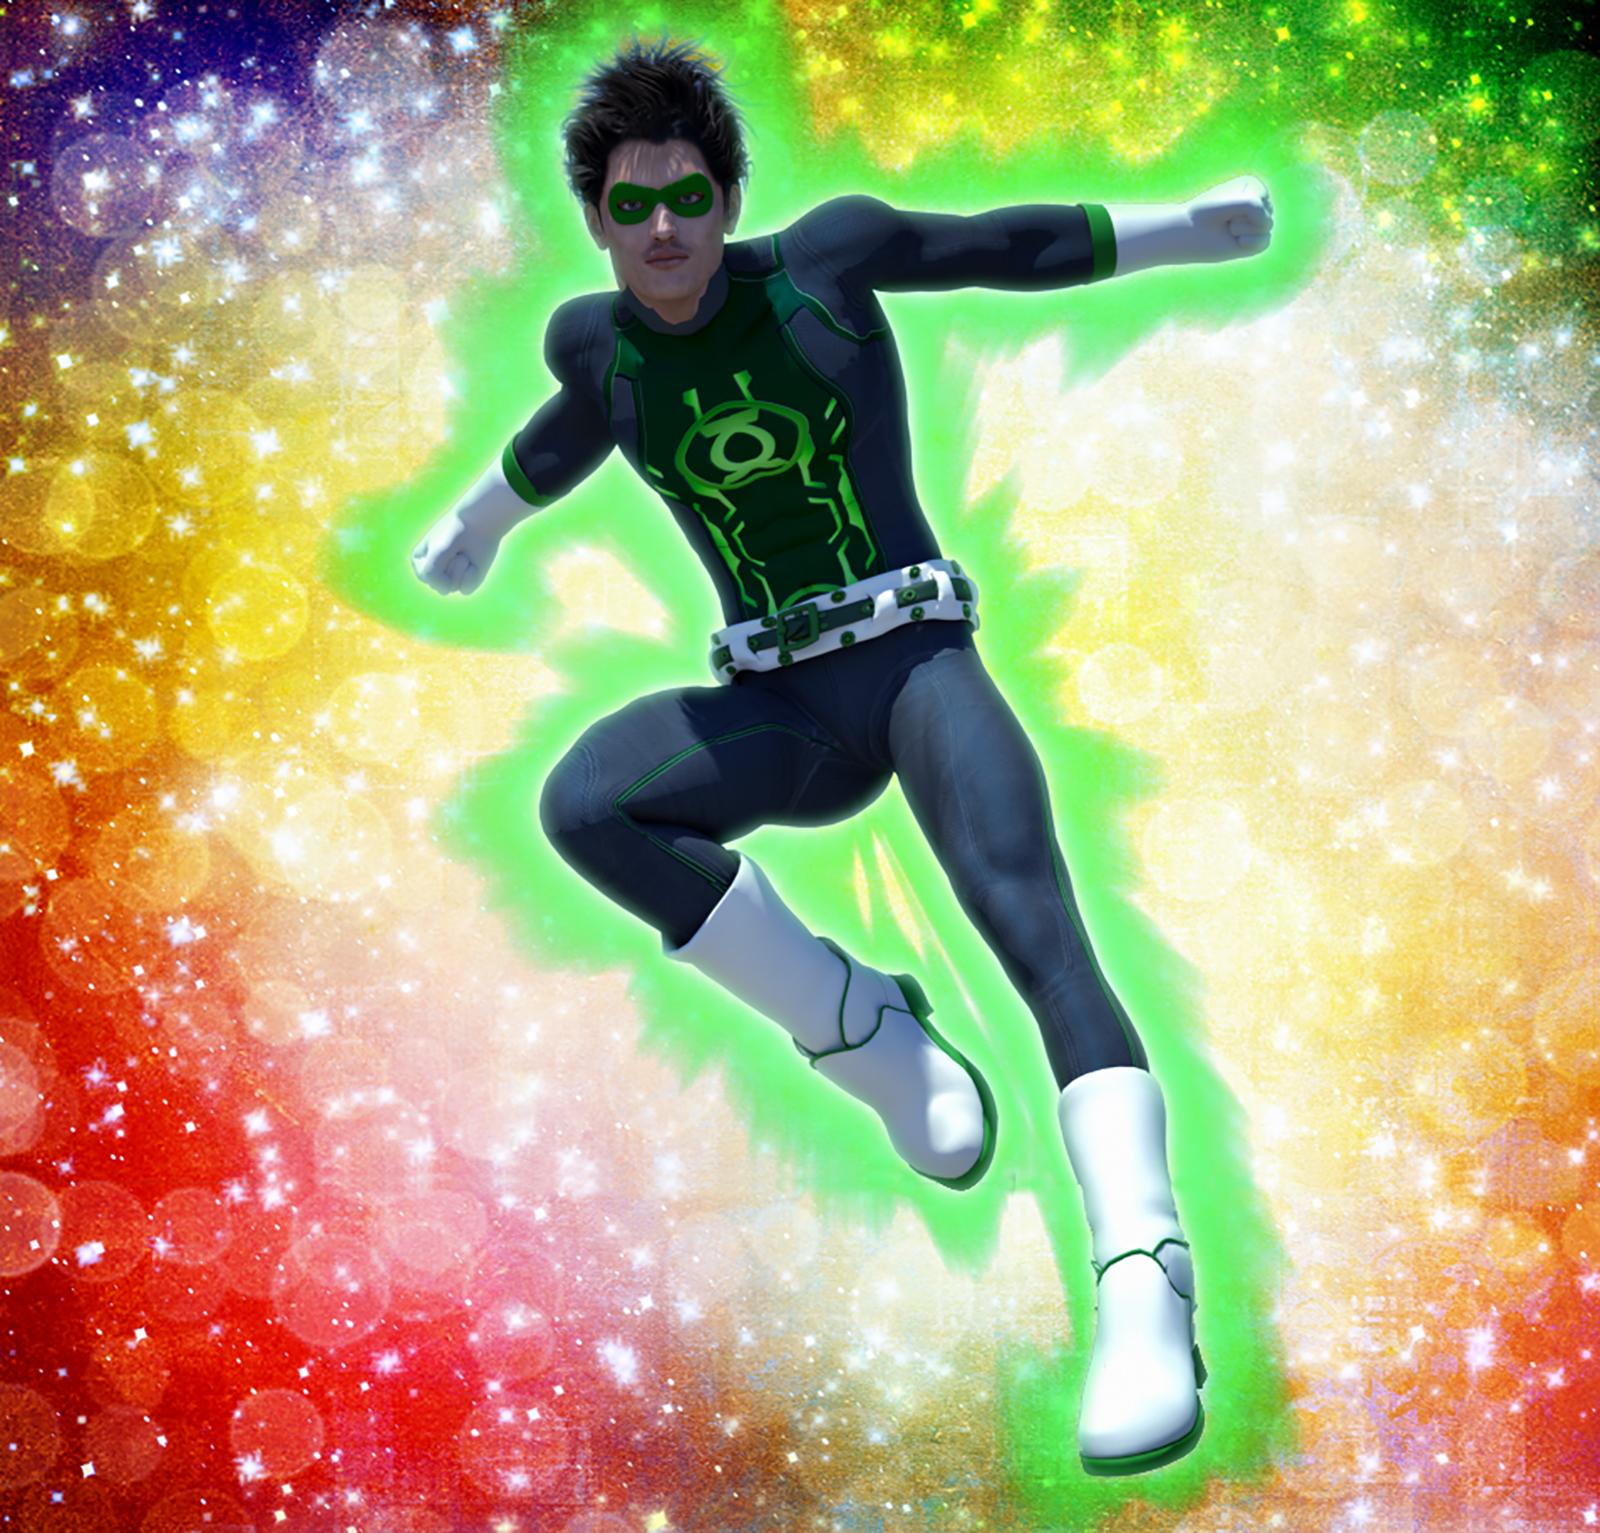 Green Lantern 2nd skin textures x M4